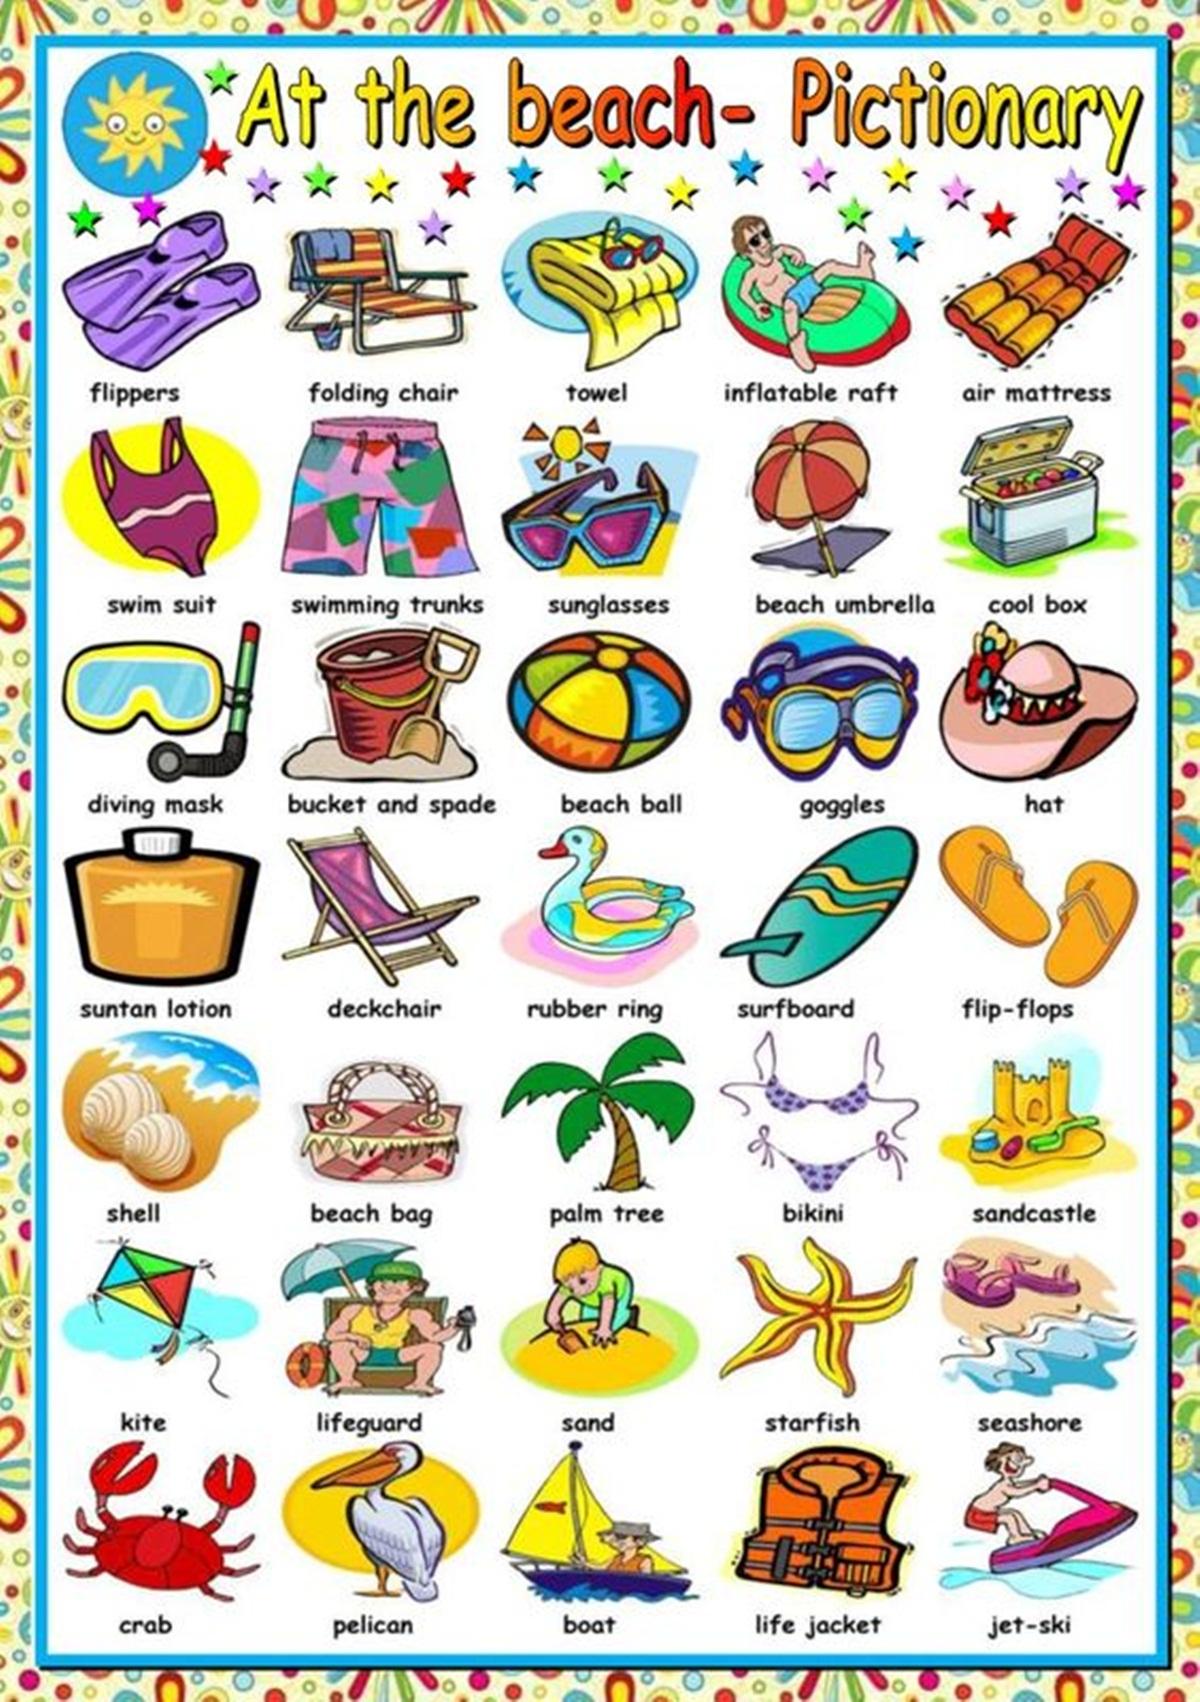 Forum English Vocabulary Fluent Land